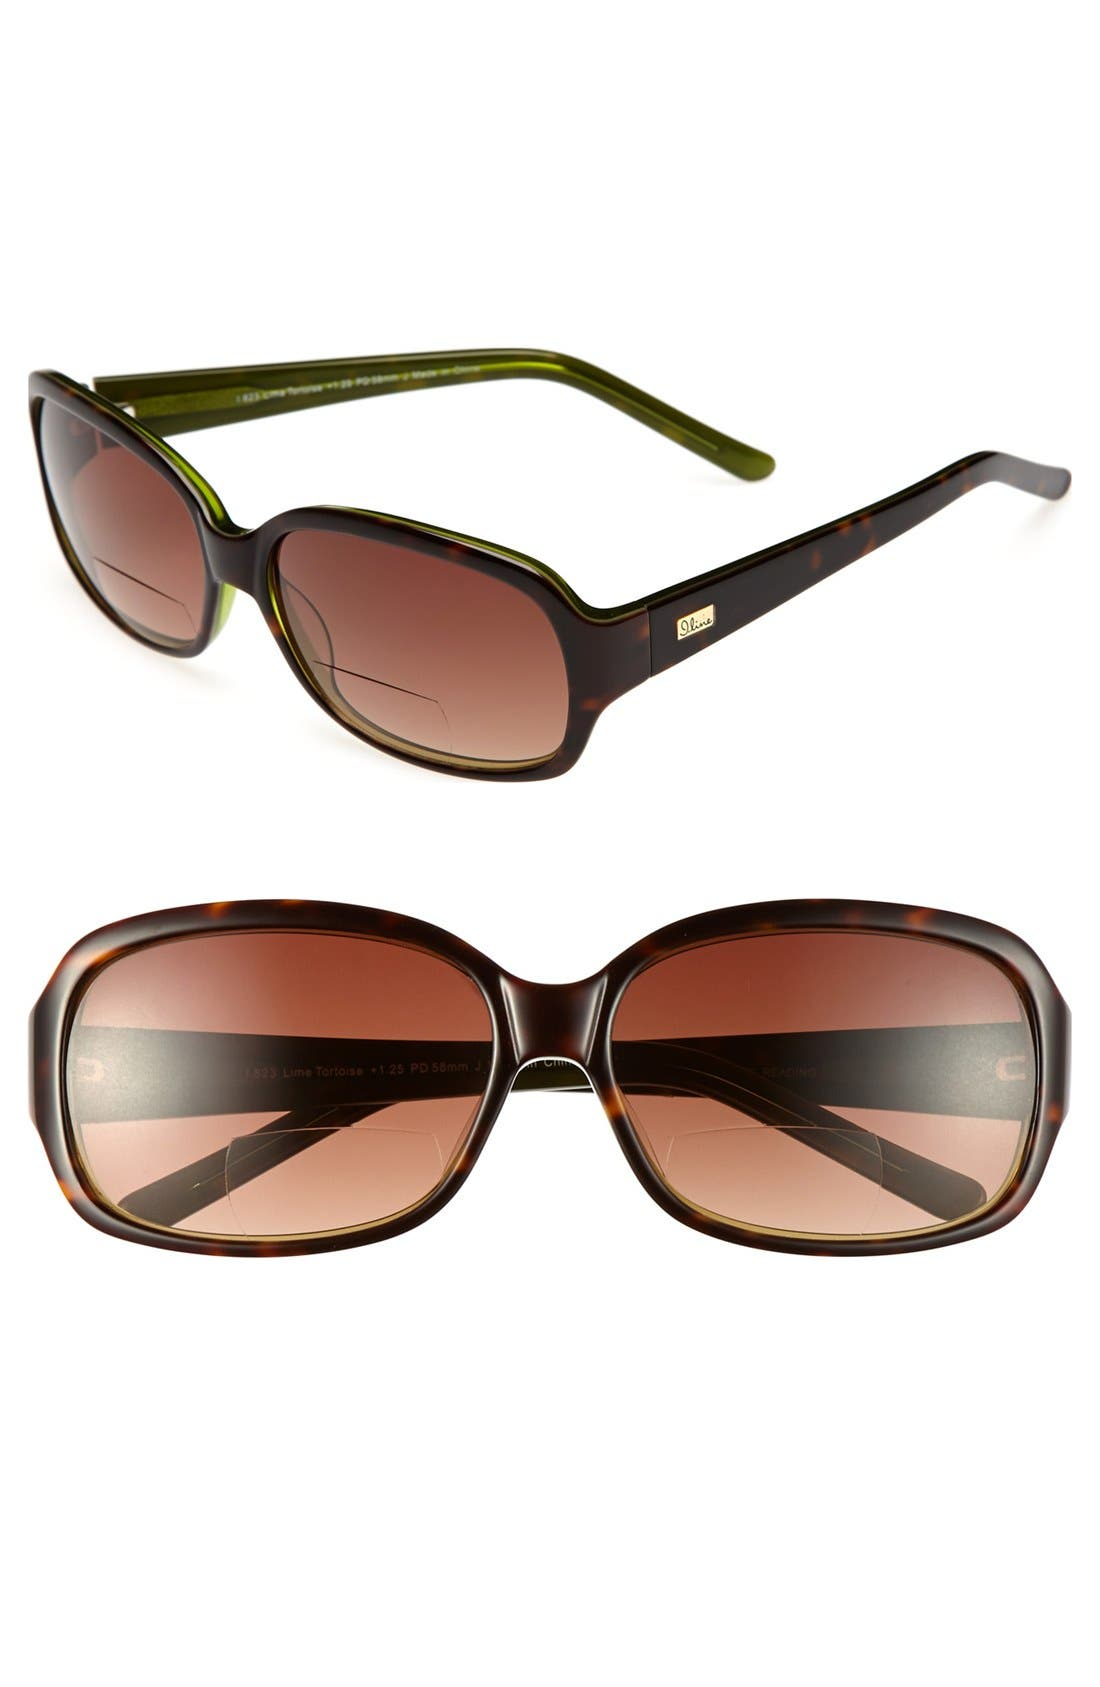 Main Image - I Line Eyewear 'Lime Tortoise' 58mm Reading Sunglasses